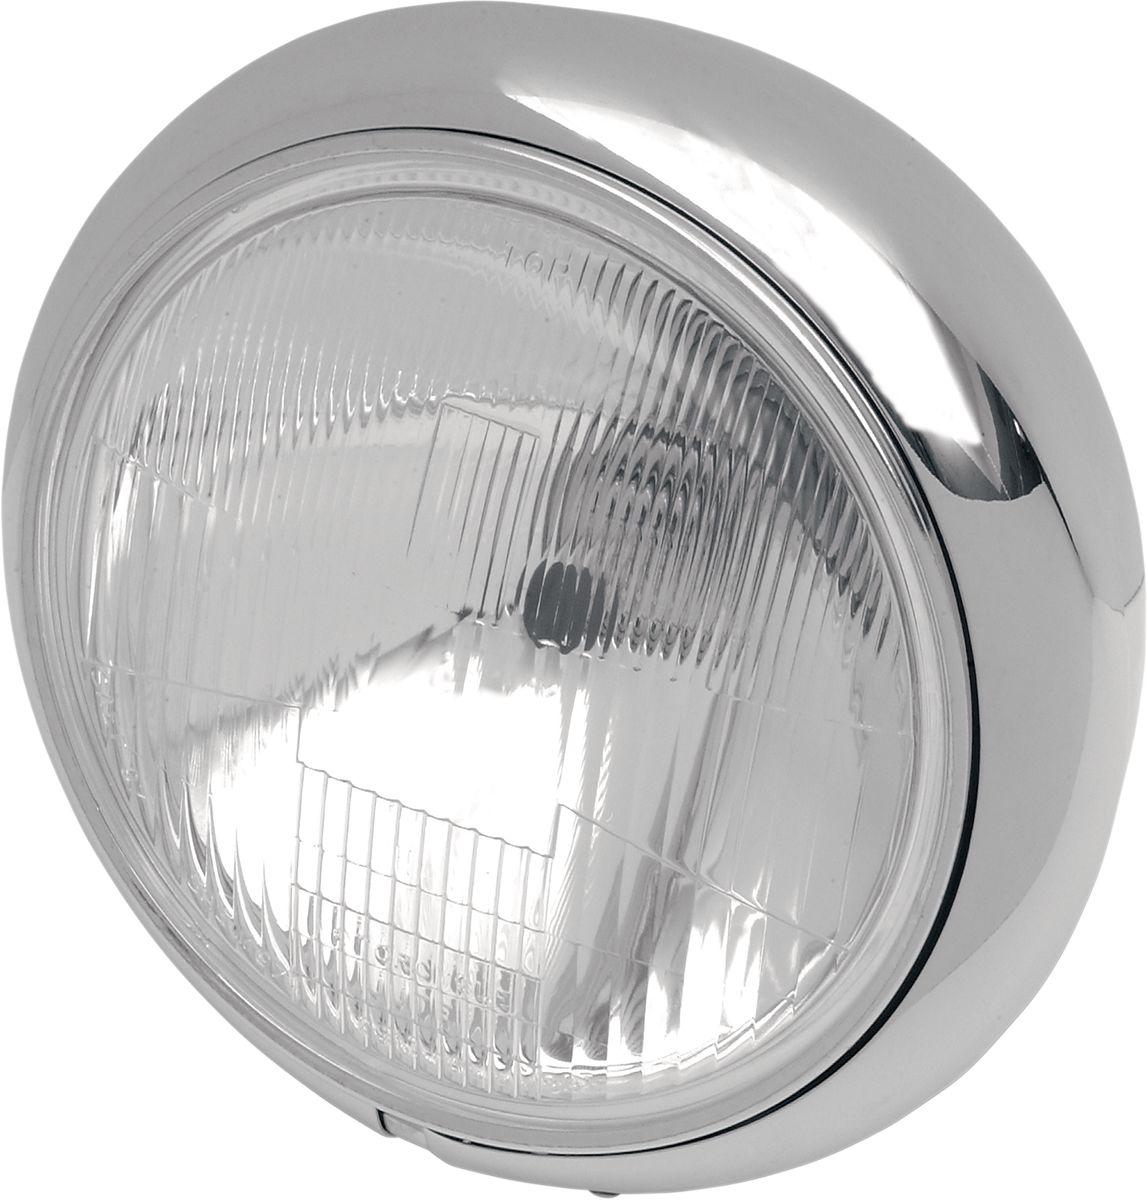 "【Drag Specialties】頭燈/ 7"" HYDRA GLIDE 附H4 【7""H-LITE HYDRA.GLIDE W/H4 [DS-280037]】 - 「Webike-摩托百貨」"